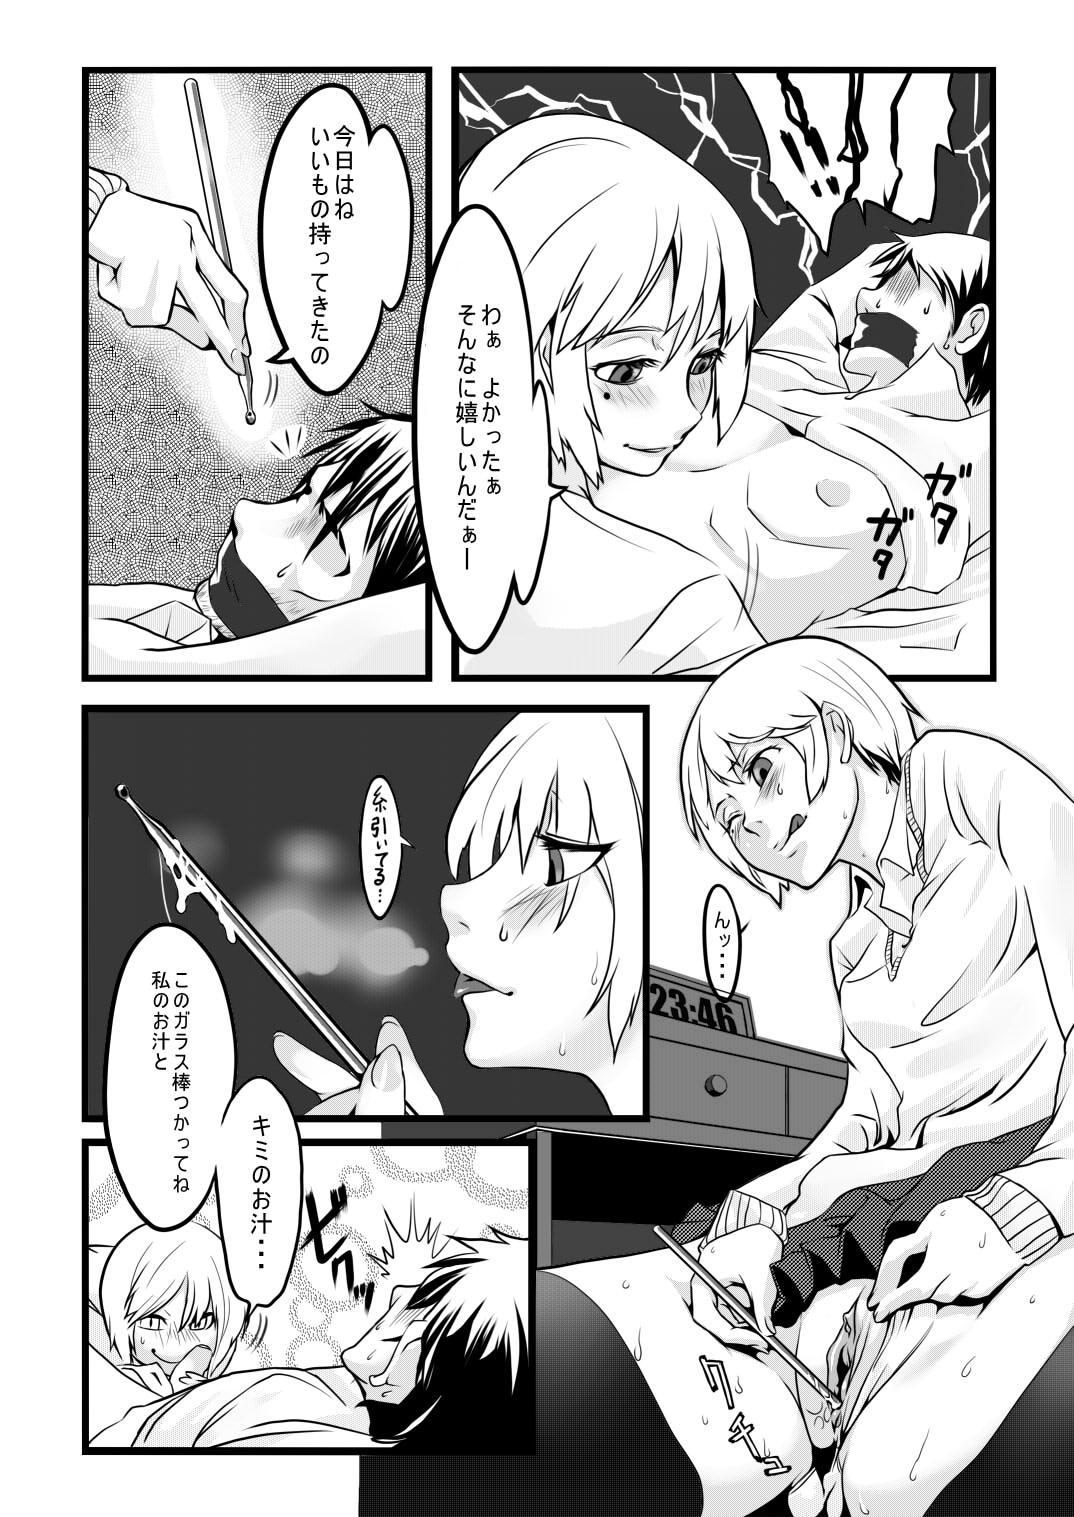 Tamazeme to Nyoudou Seme no Manga 2